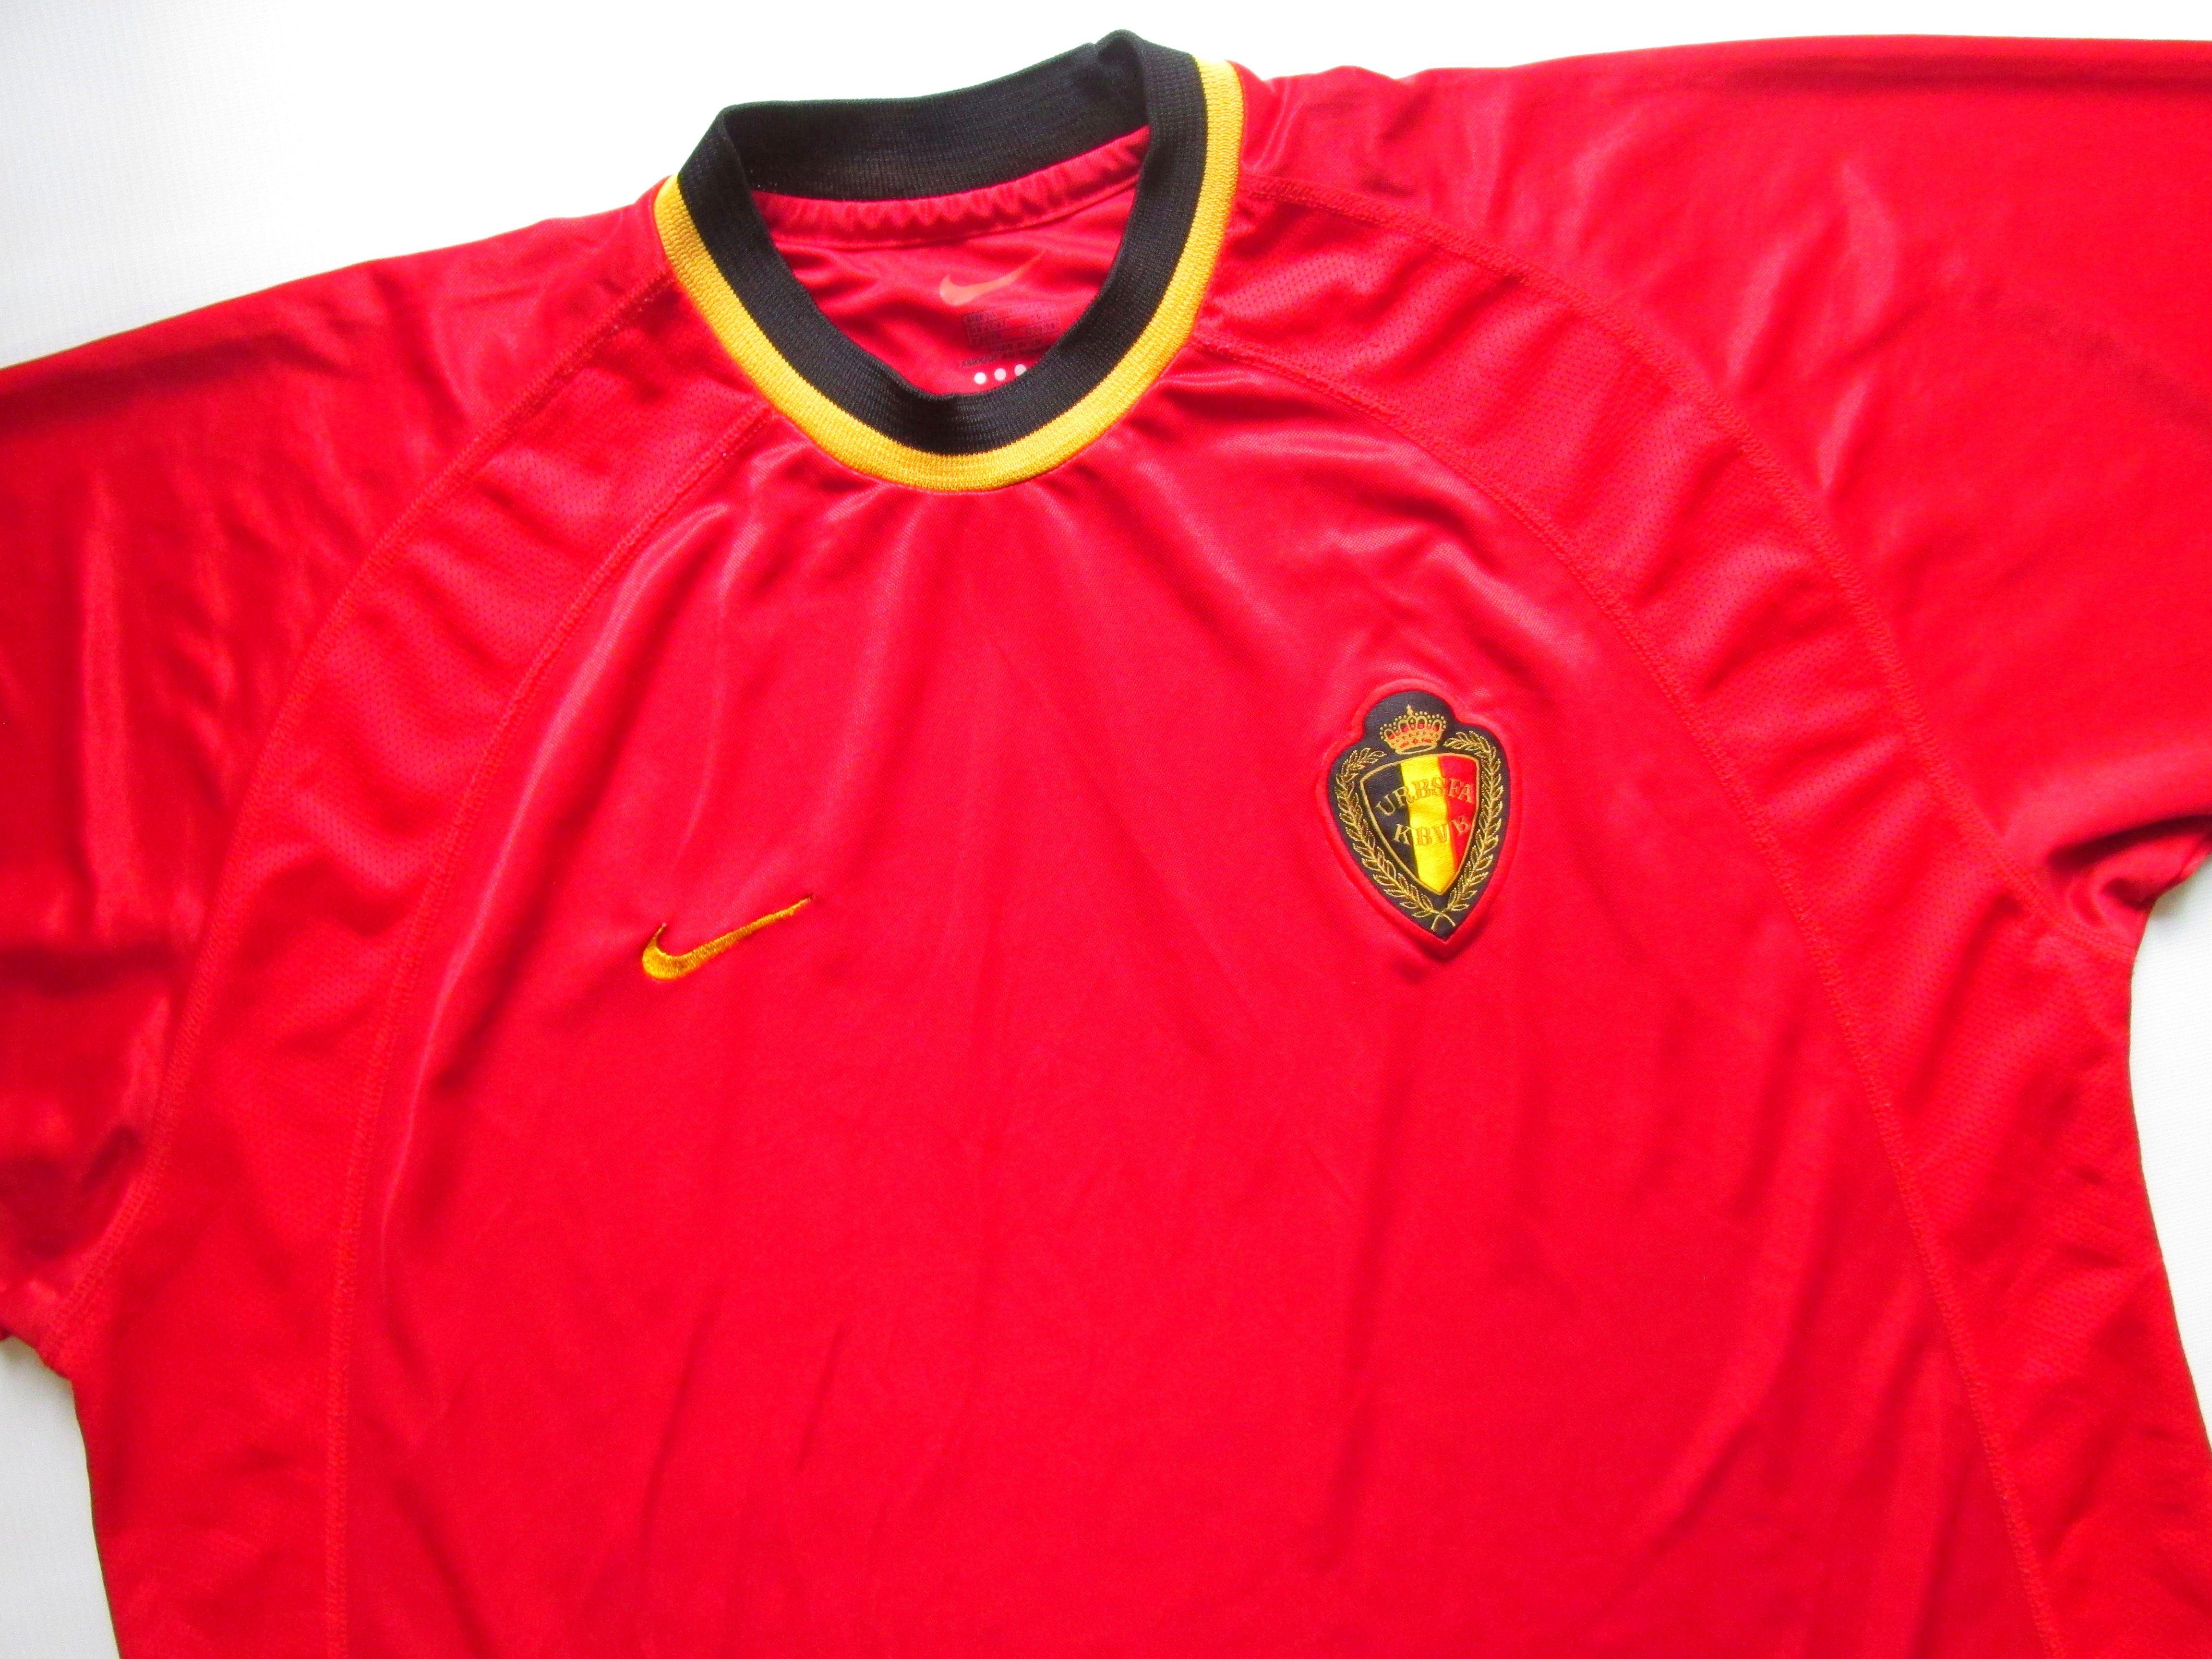 Belgium Euro 2000 2001 2002 Home Football Shirt Jersey Maillot Trikot Nike Xl Ebay Football Shirts National Football Teams Football